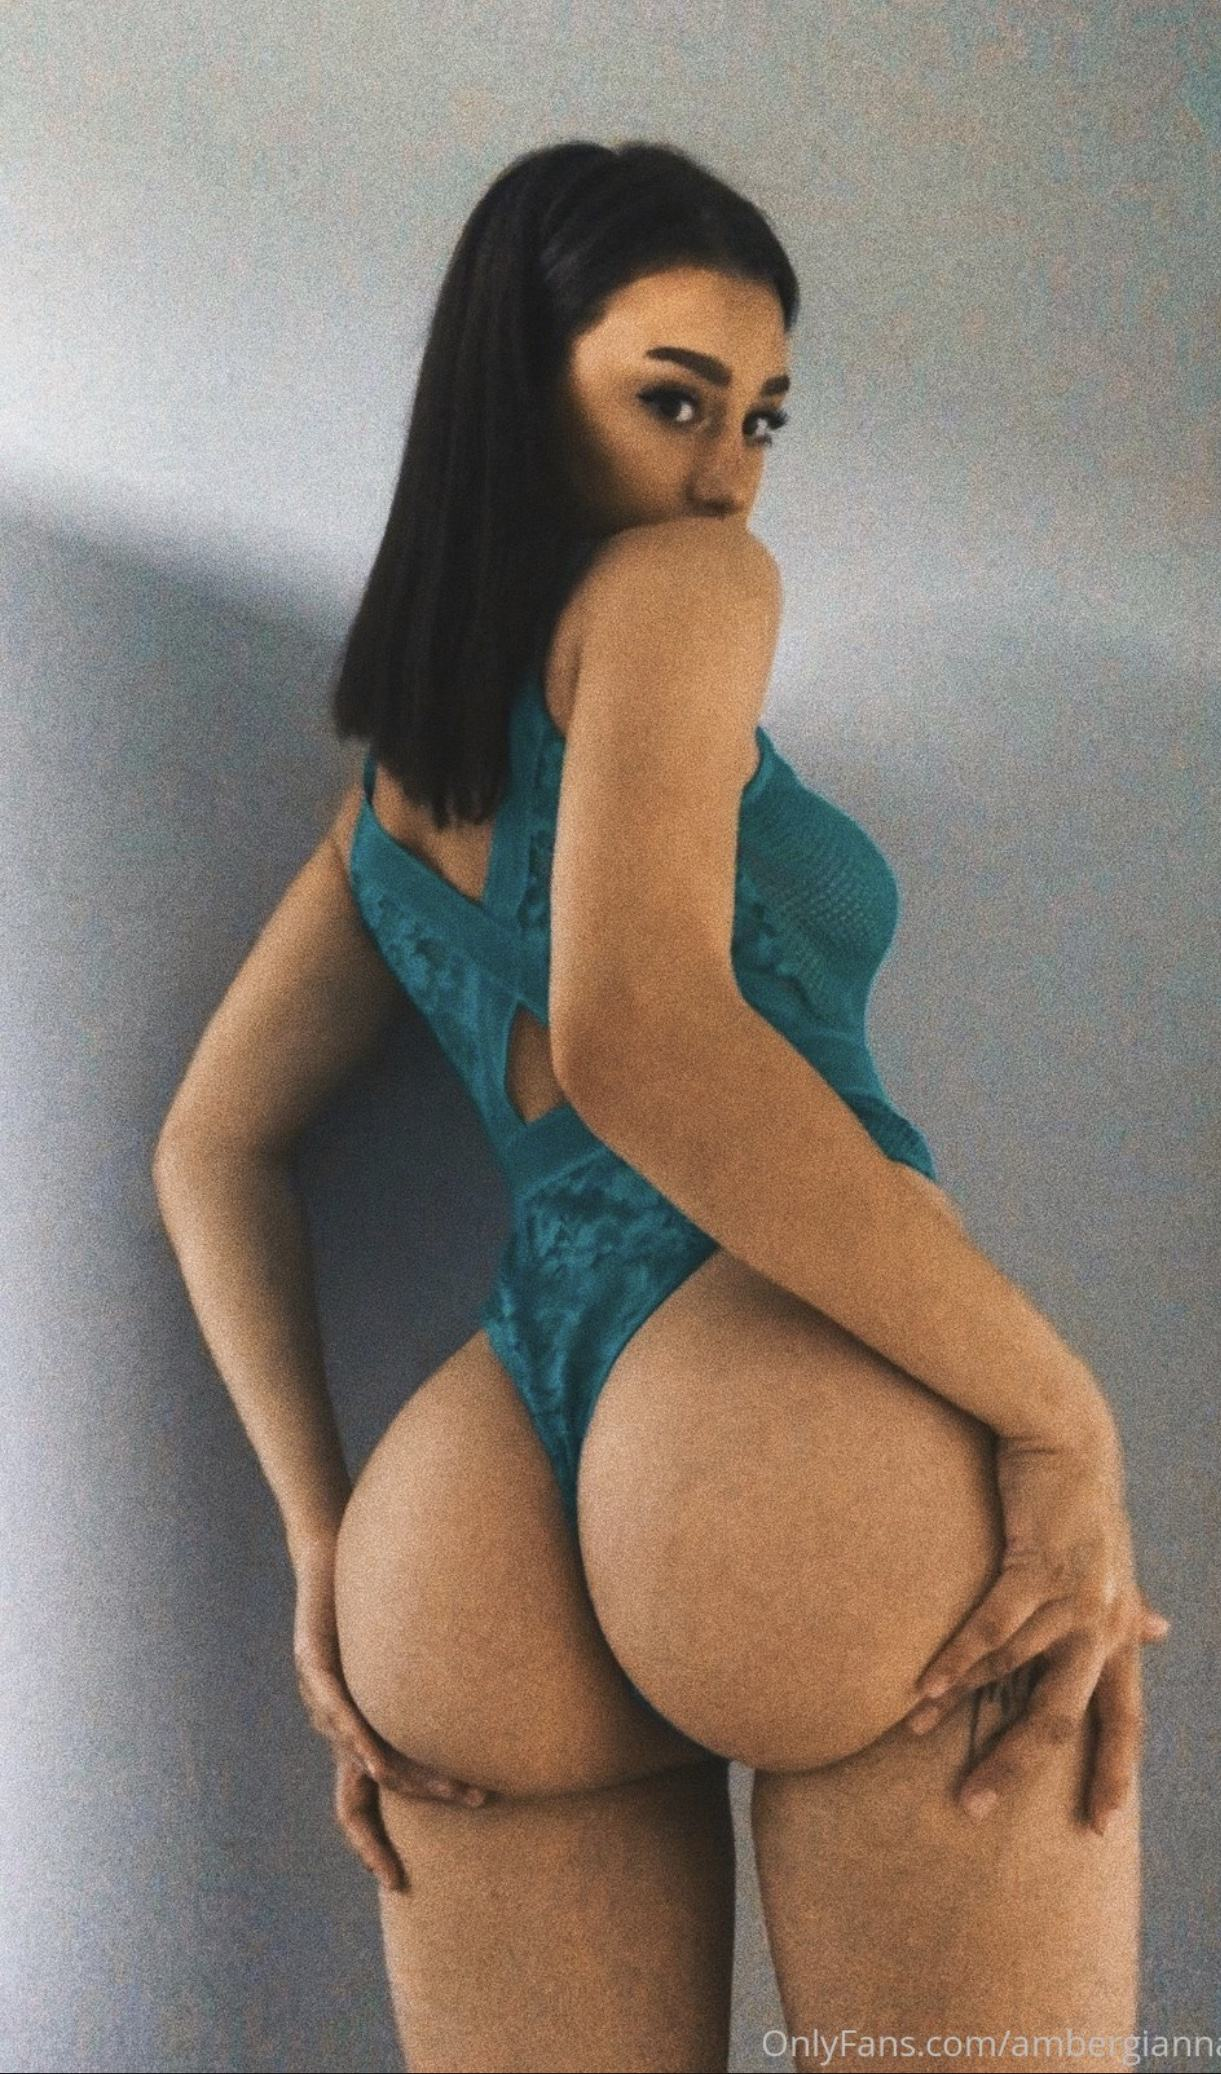 Amber Gianna Onlyfans 0067